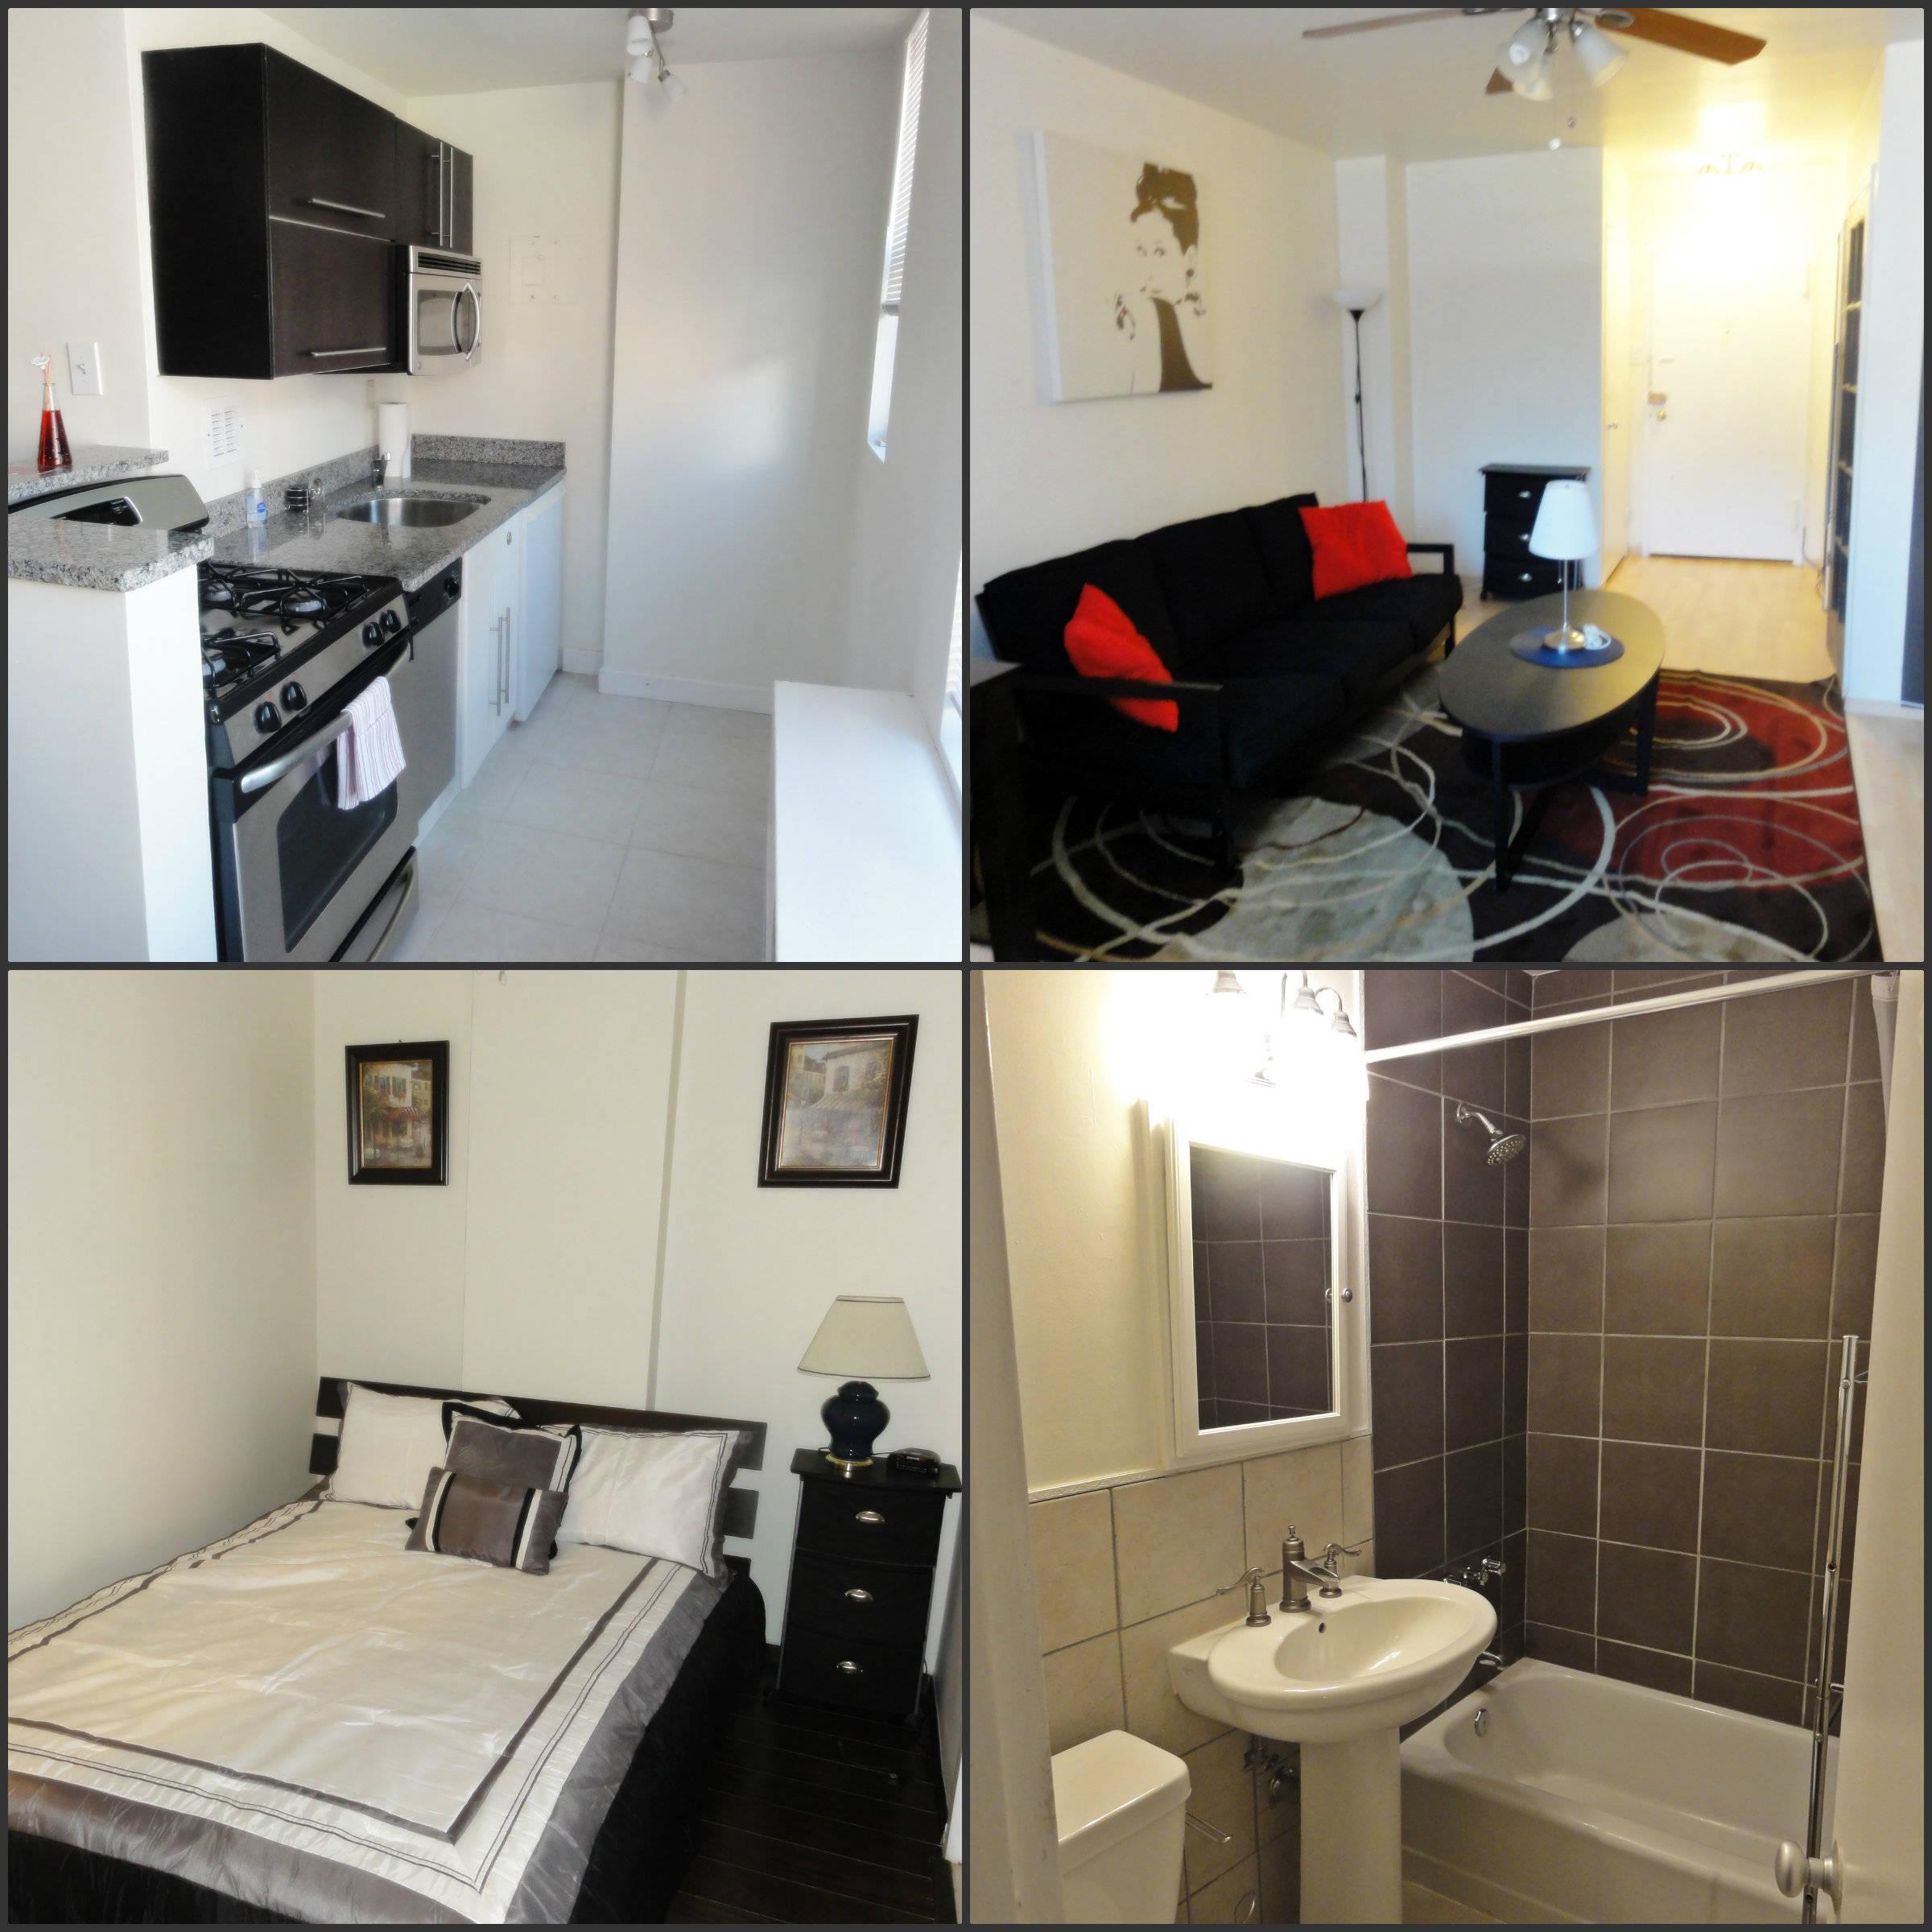 For Rent In River Place Arlington Va Junior 1 Bedroom